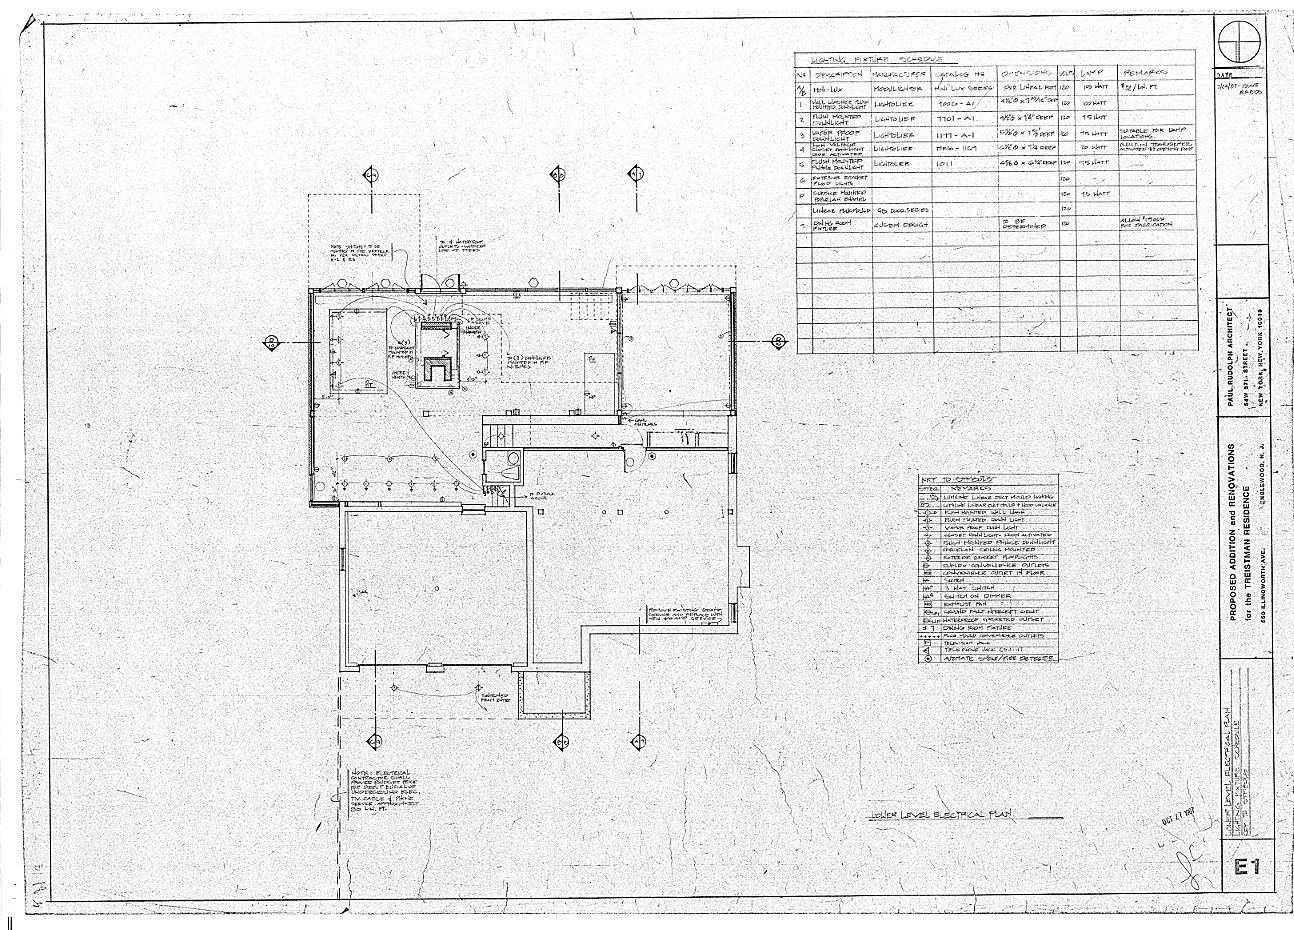 Residence for Mr. and Mrs. Treistman, Englewood, New Jersey.  Lower Level, Sheet E1.